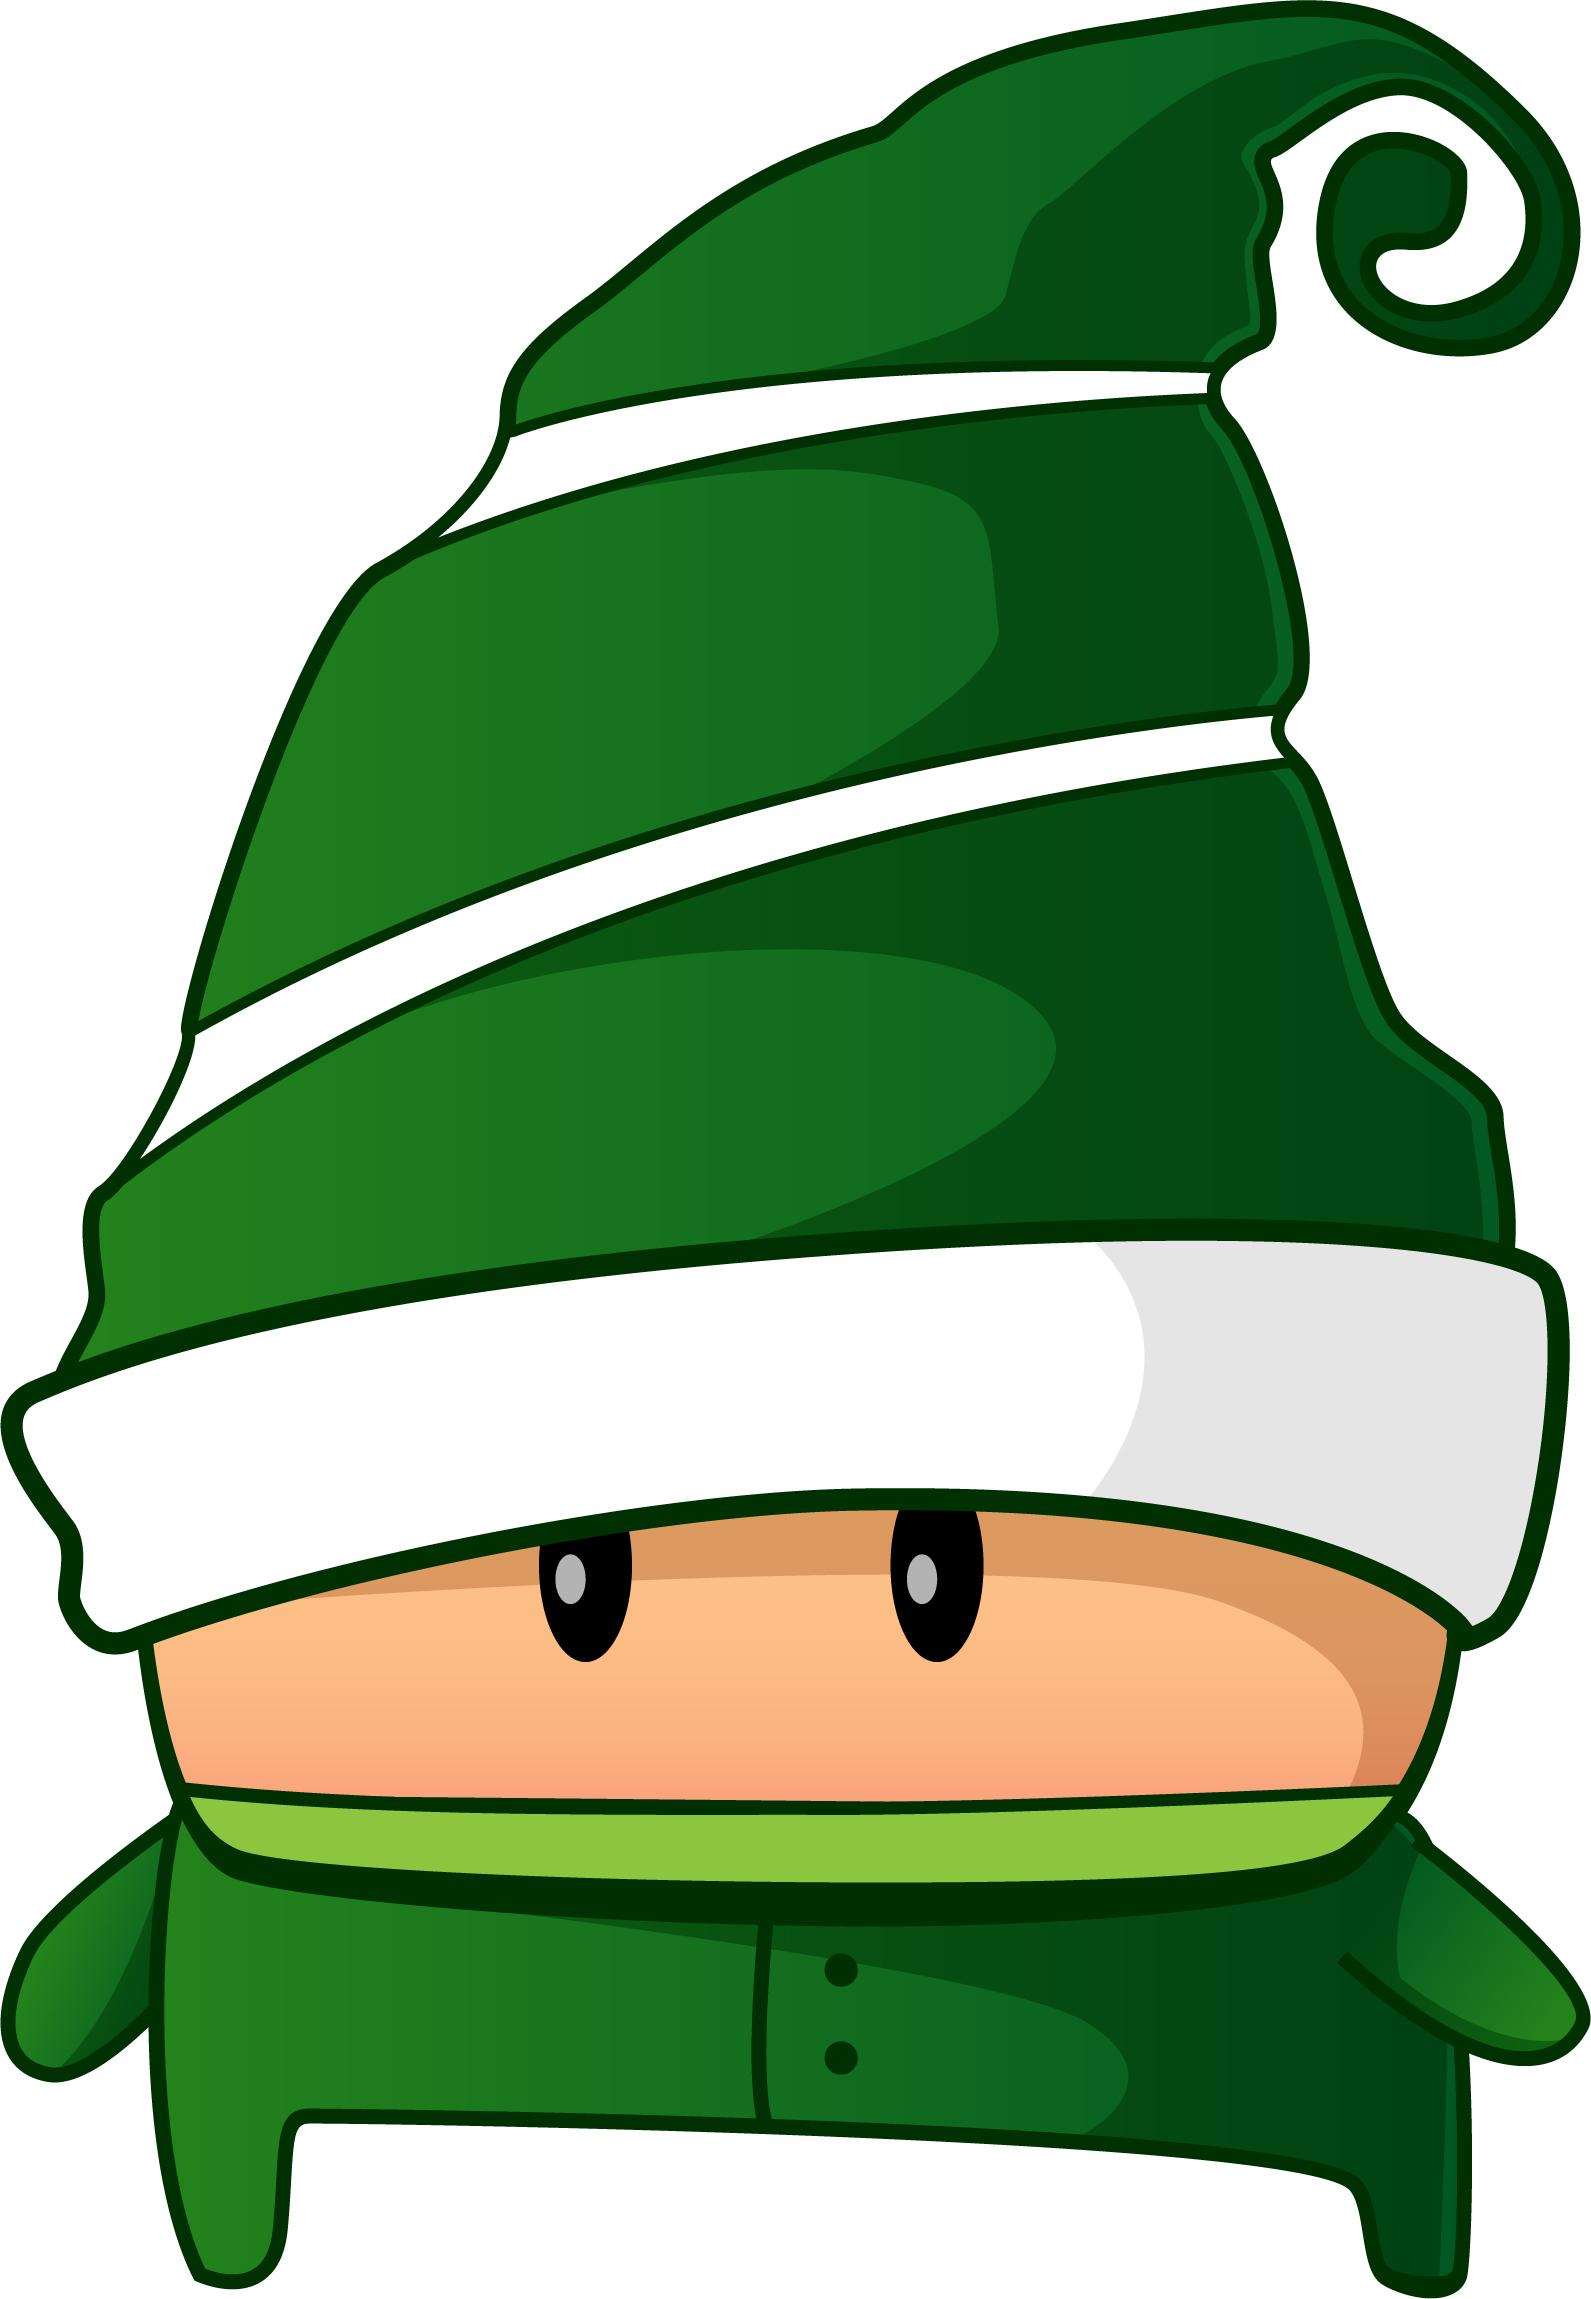 Christmas Elf 2.jpg